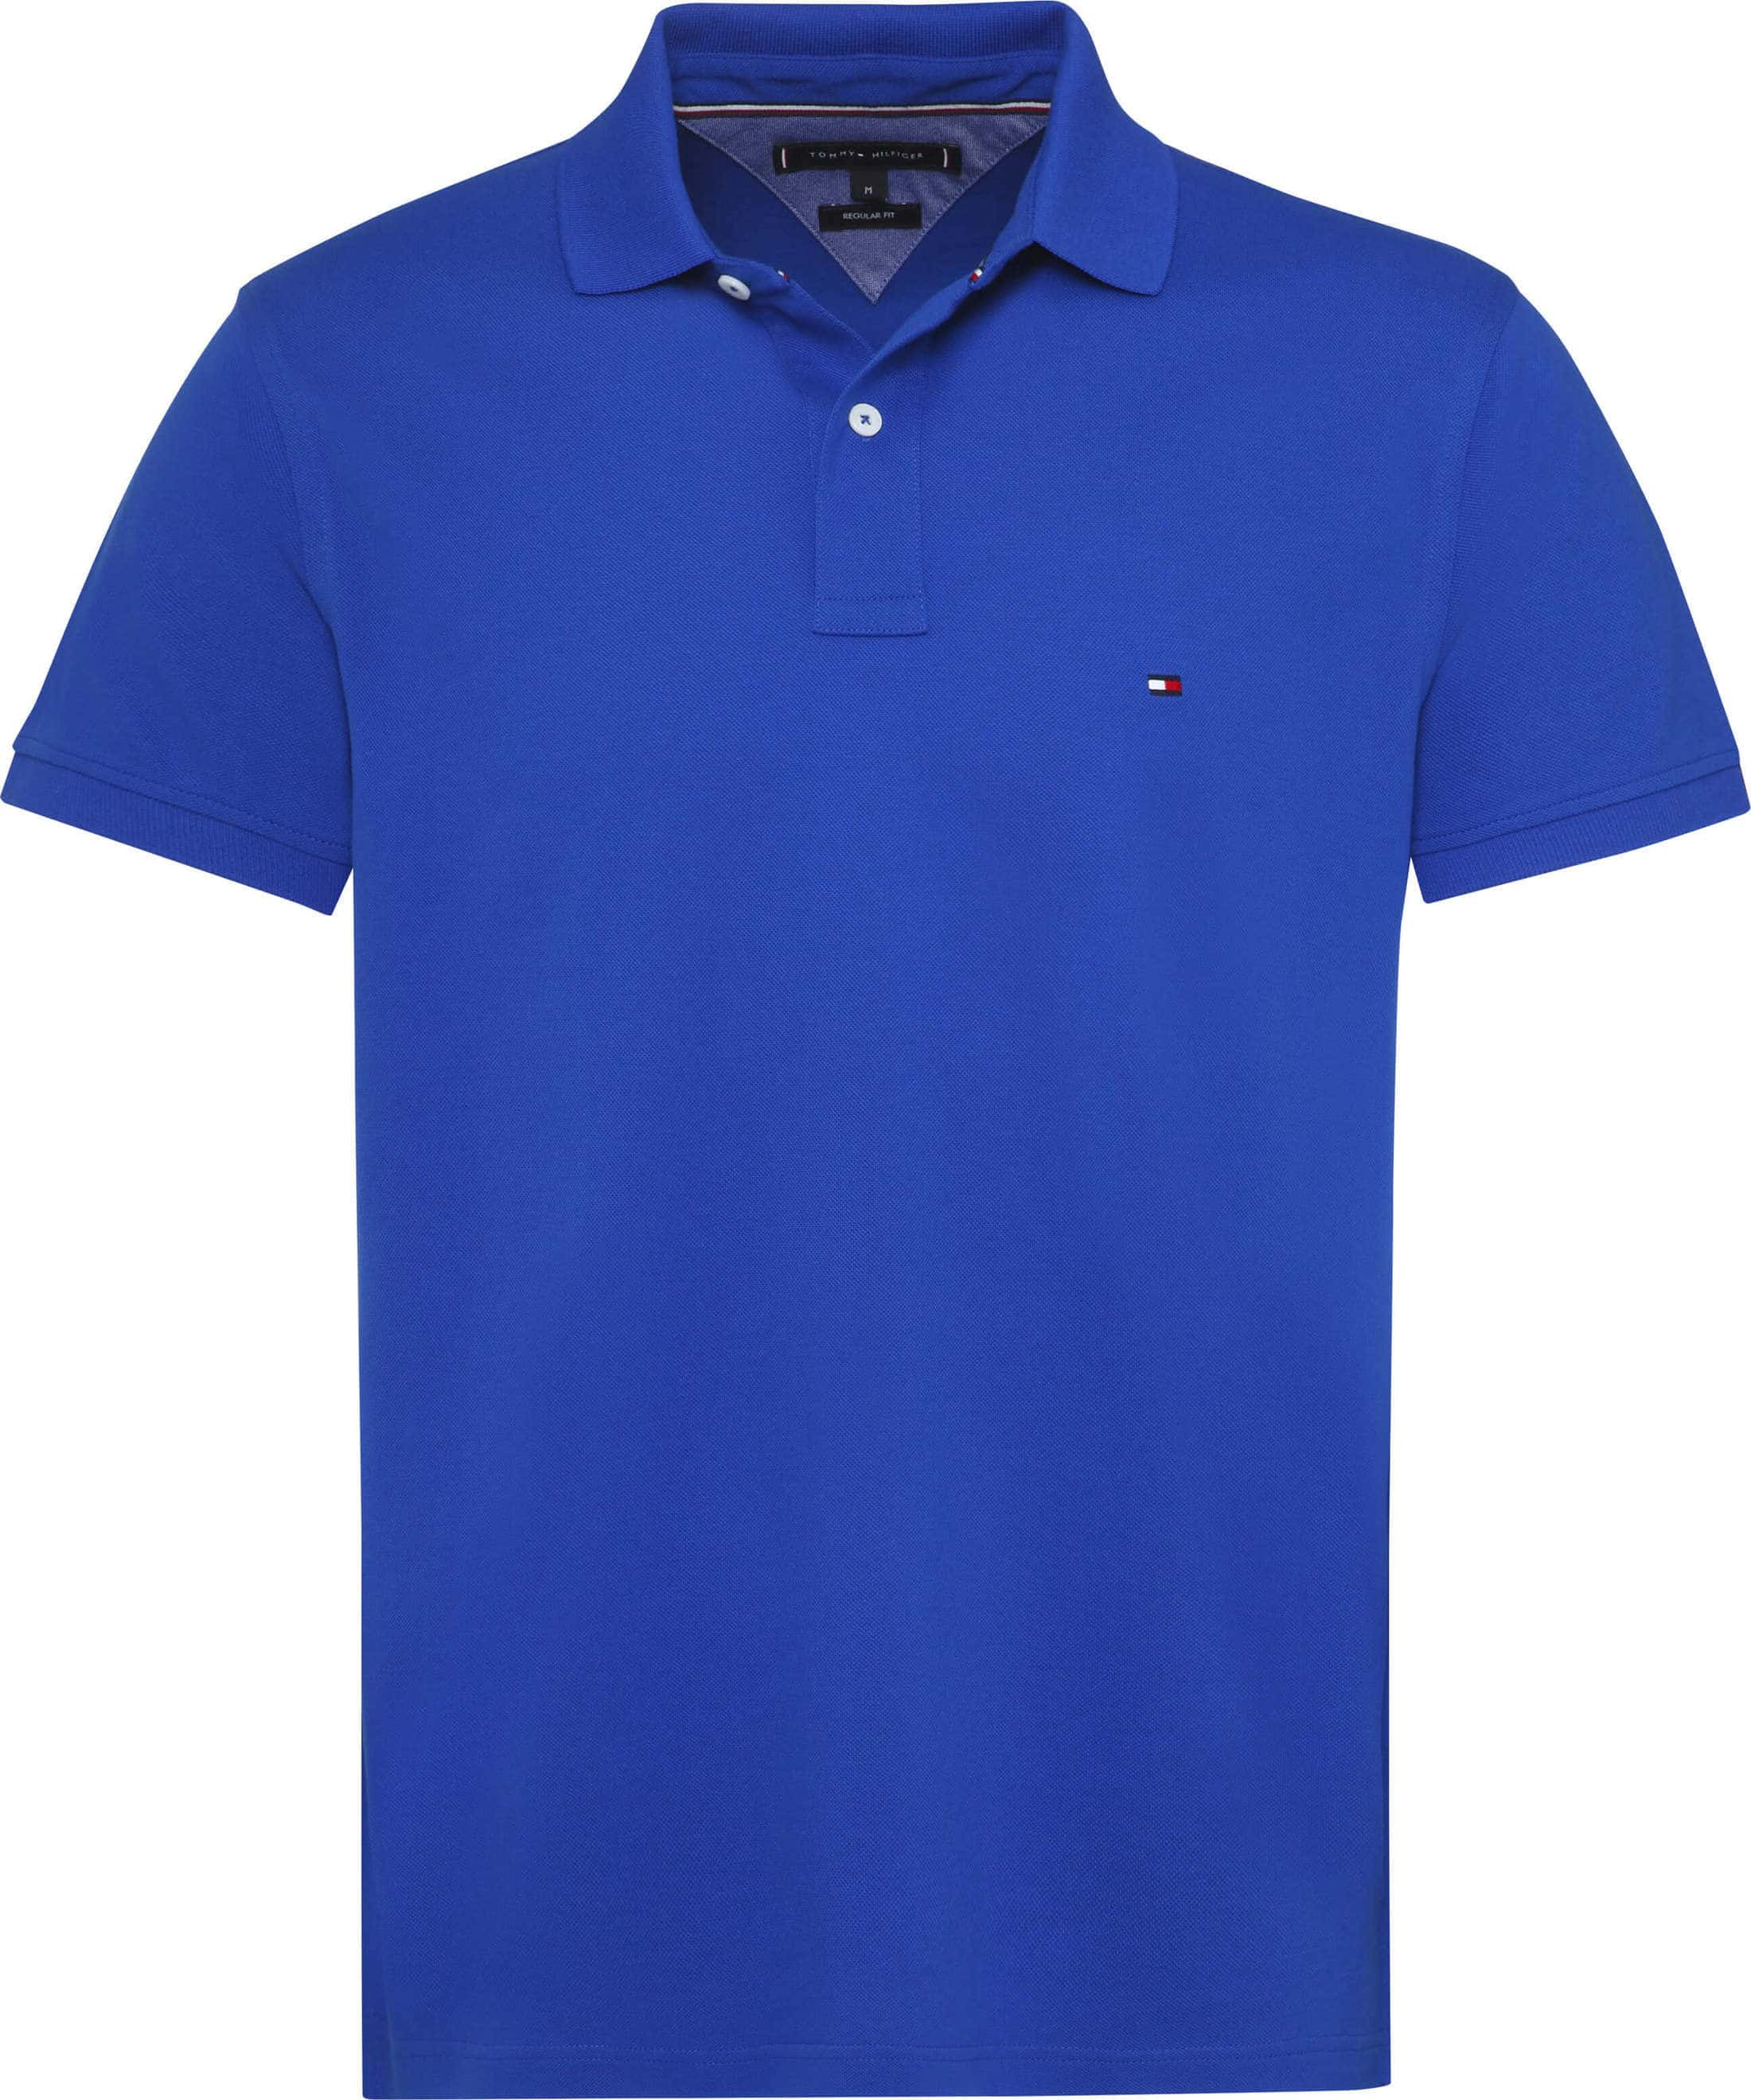 93306637 Tommy Hilfiger Poloshirt RF Cobalt MW0MW09733436 order online | Suitable